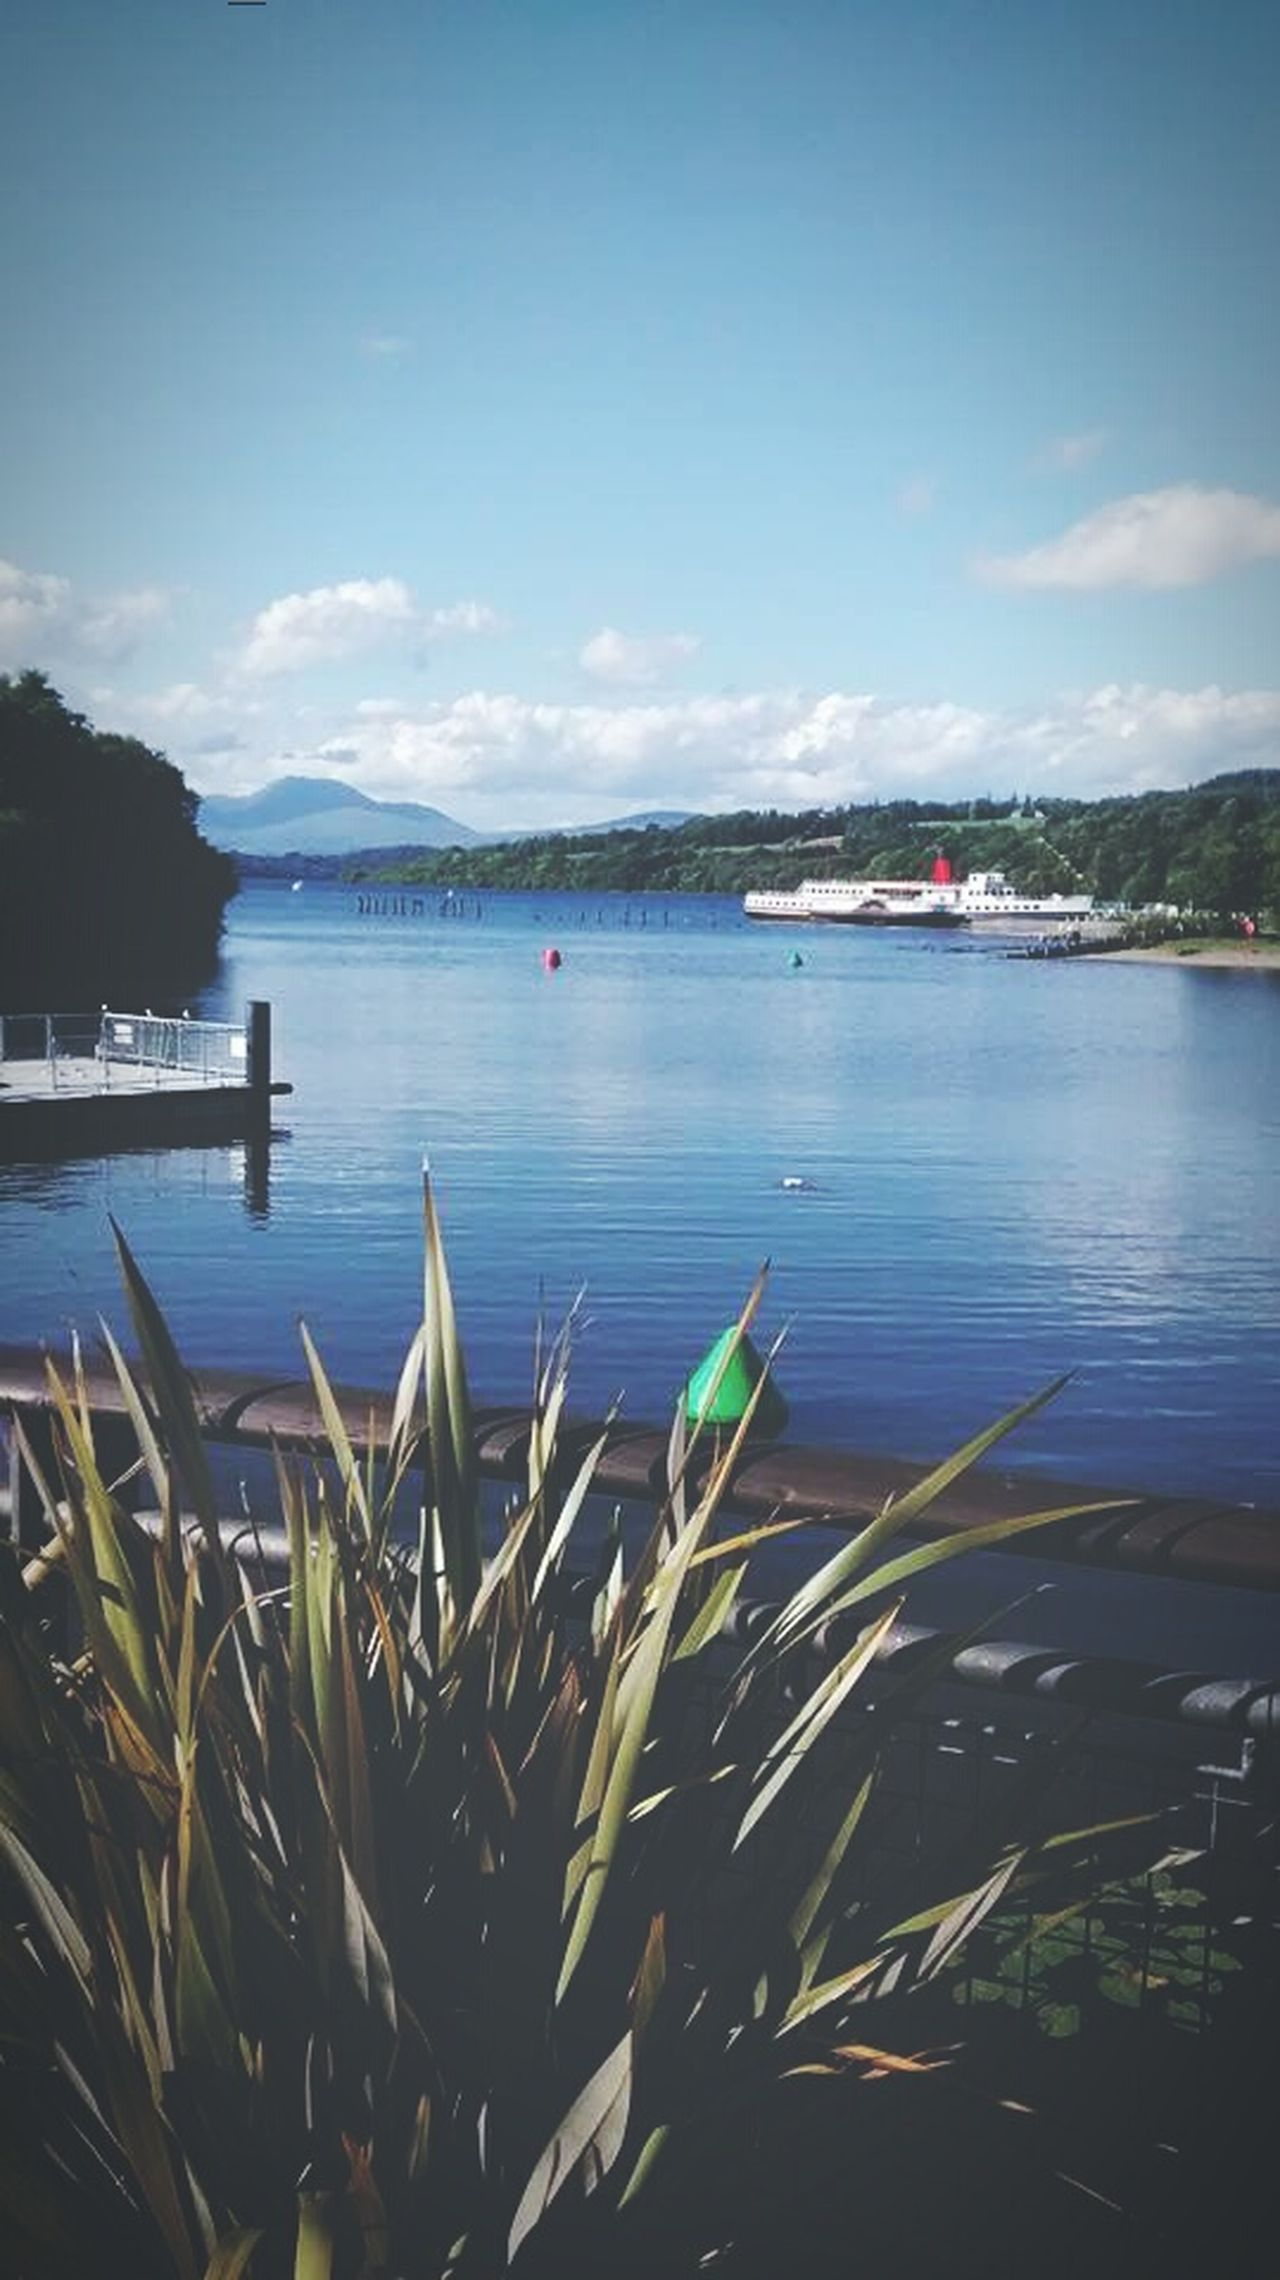 Loch Lomond. LochLomond Scotland Loch  Scenery Hill EyeEm Getty Collection